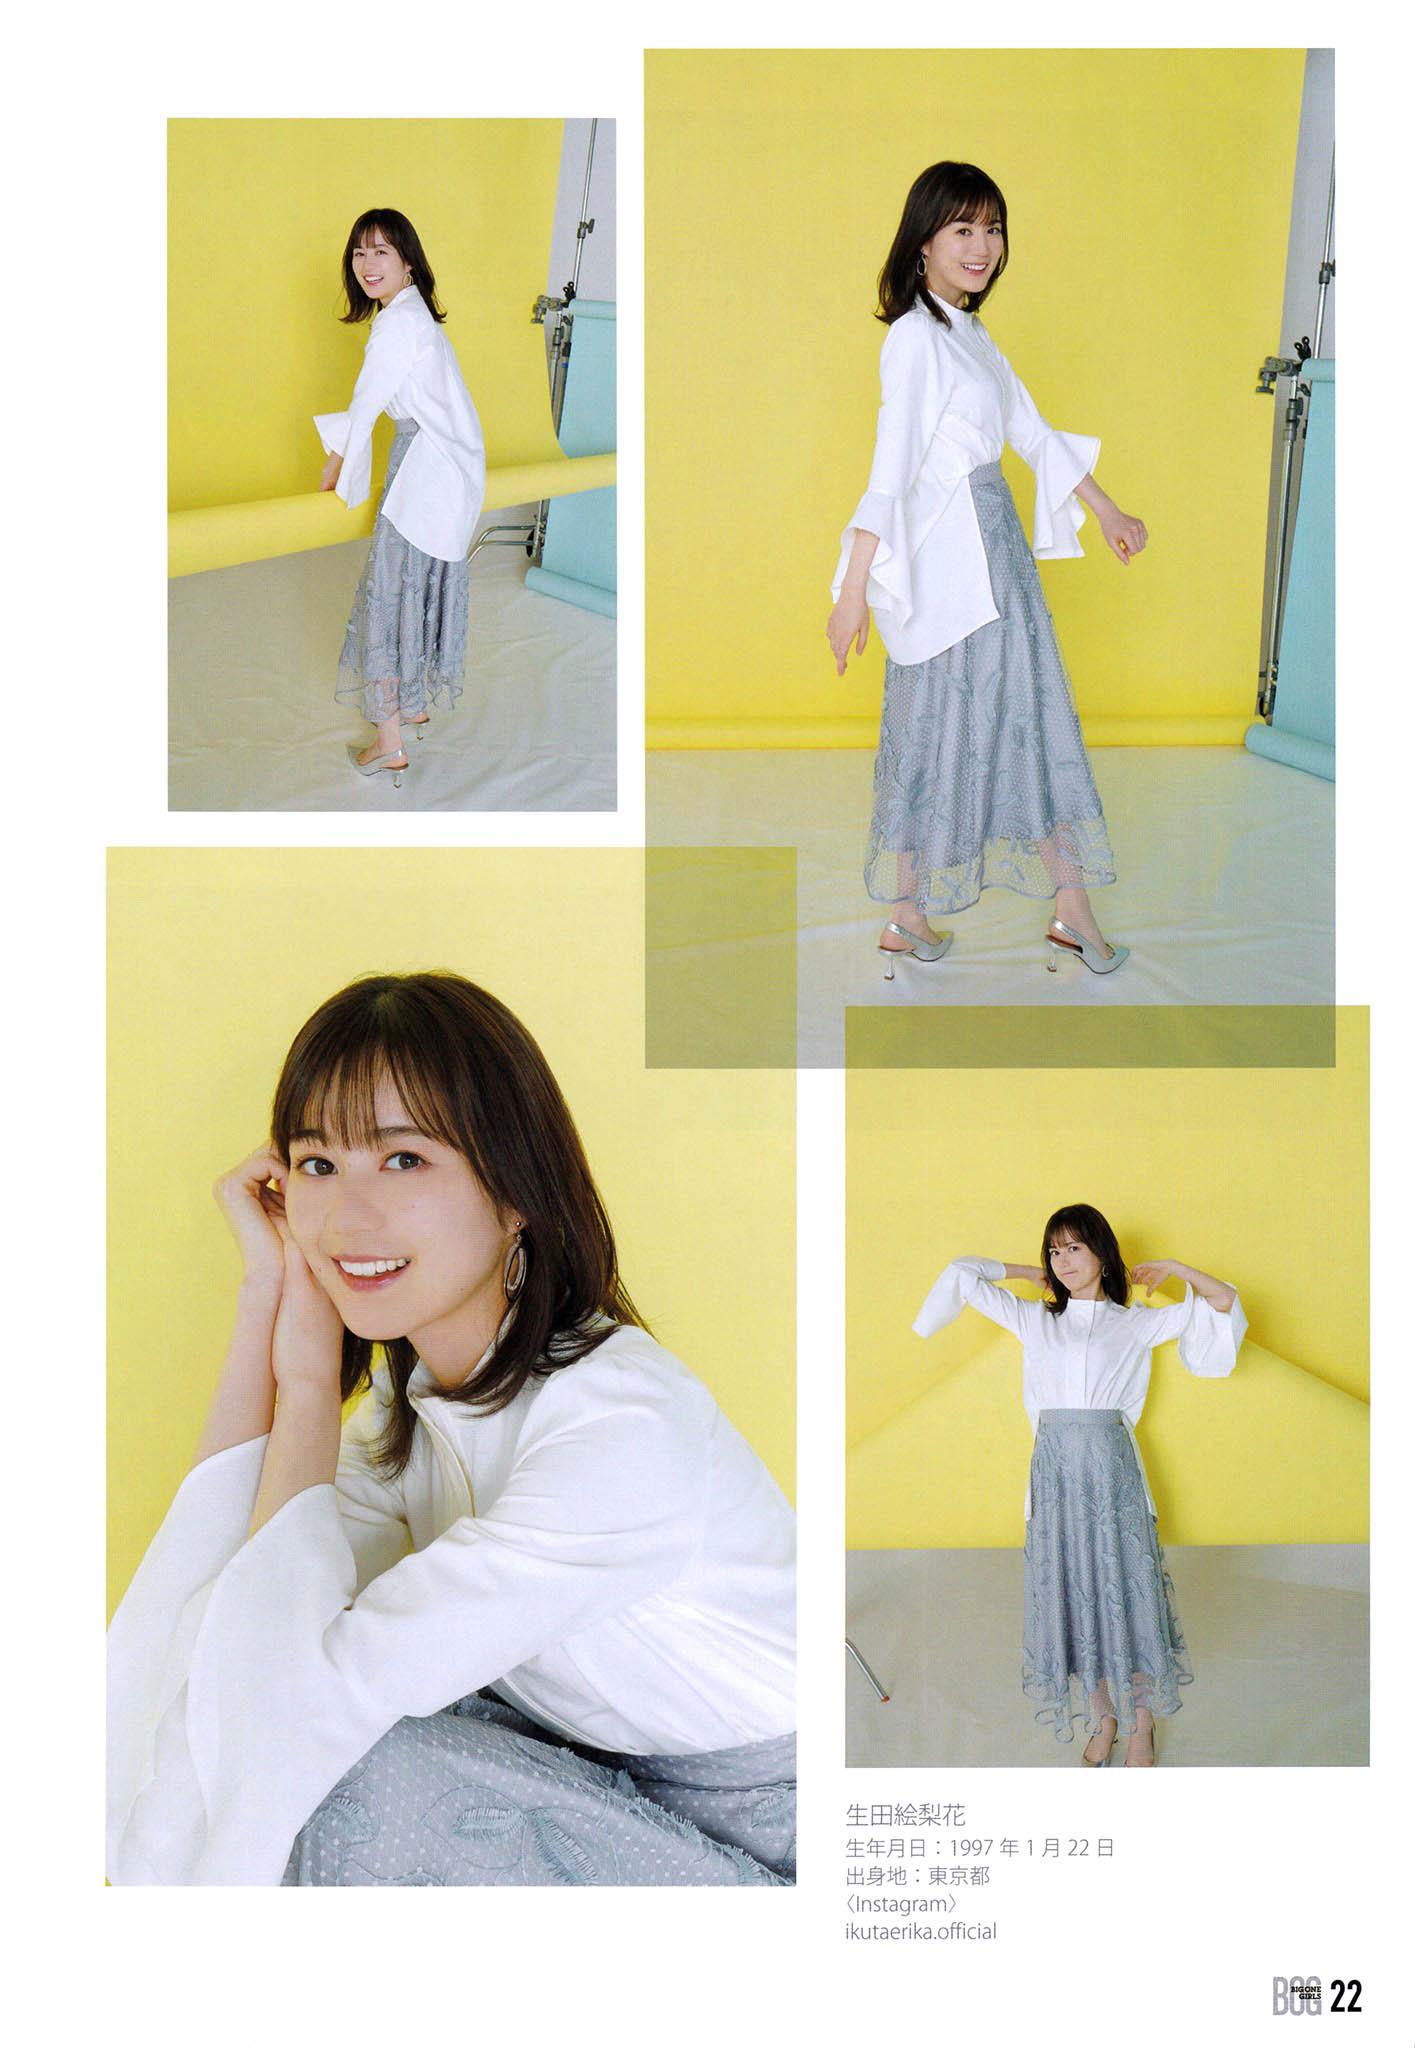 EIkuta SMatsumura Big One Girls 2105 07.jpg